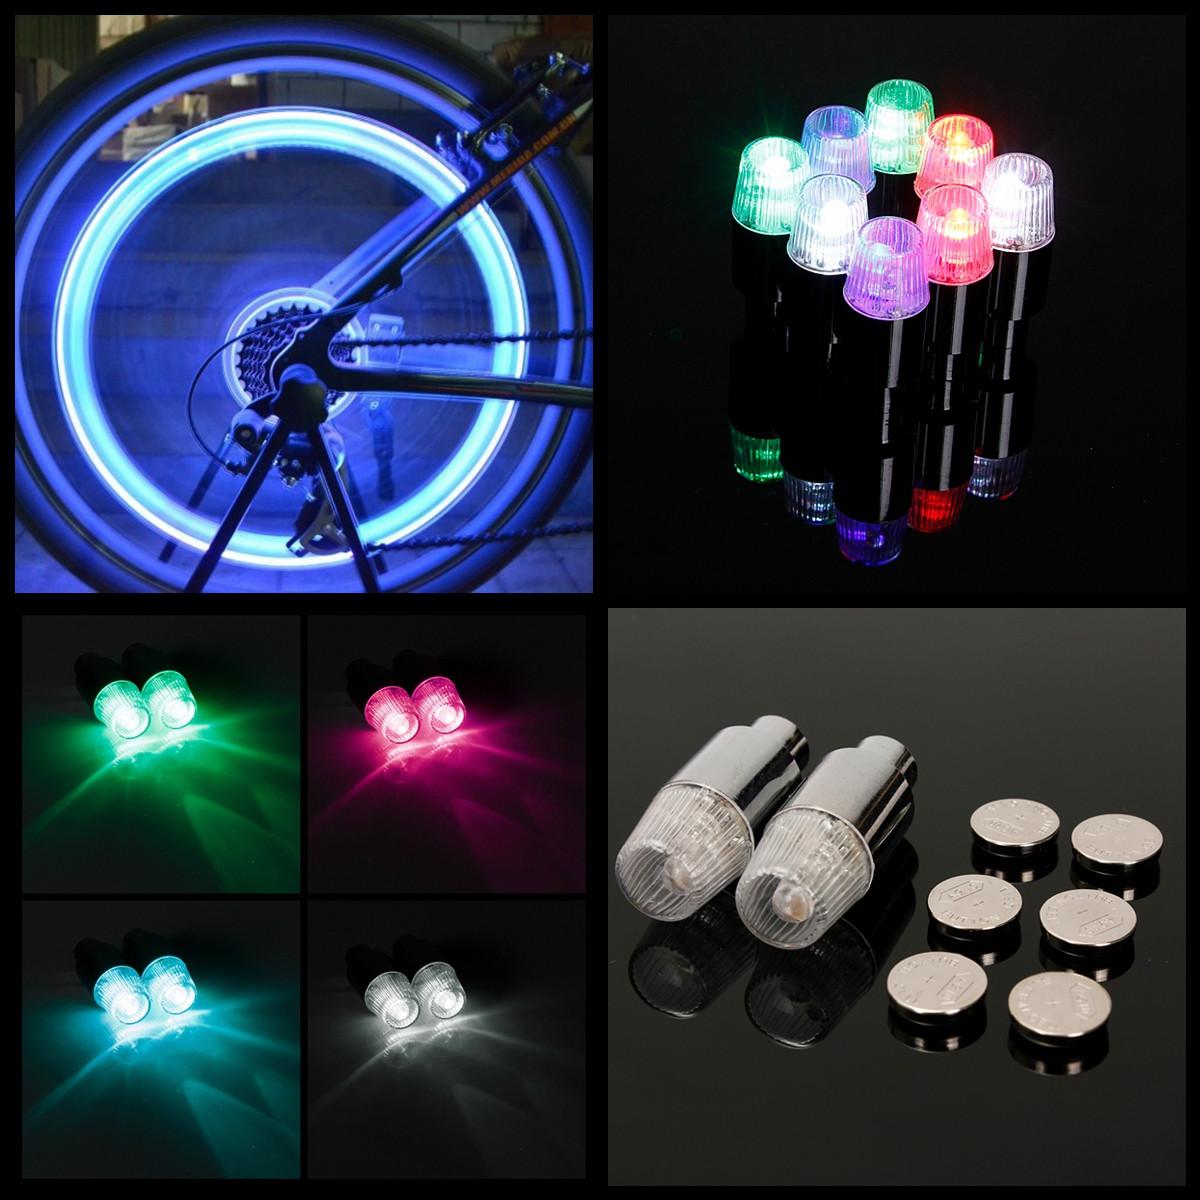 4*Bicycle LED Wheel Light Bike Tire Neon Lamp Car Motorcycle Valve Stem Dust Cap